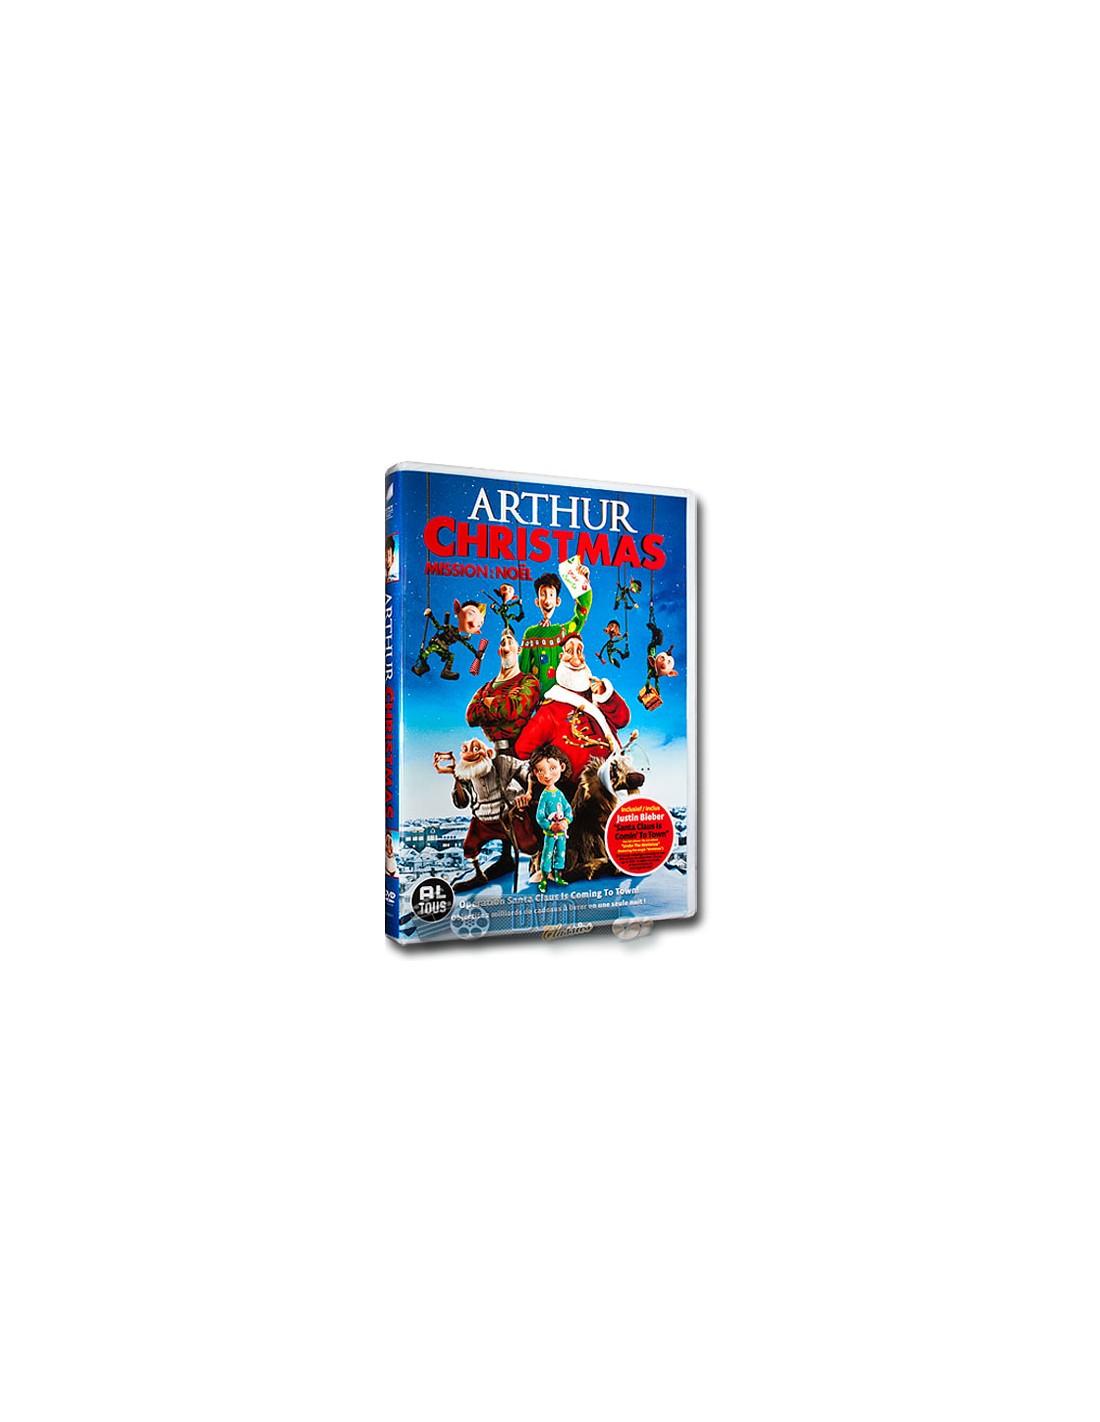 arthur christmas dvd unboxing